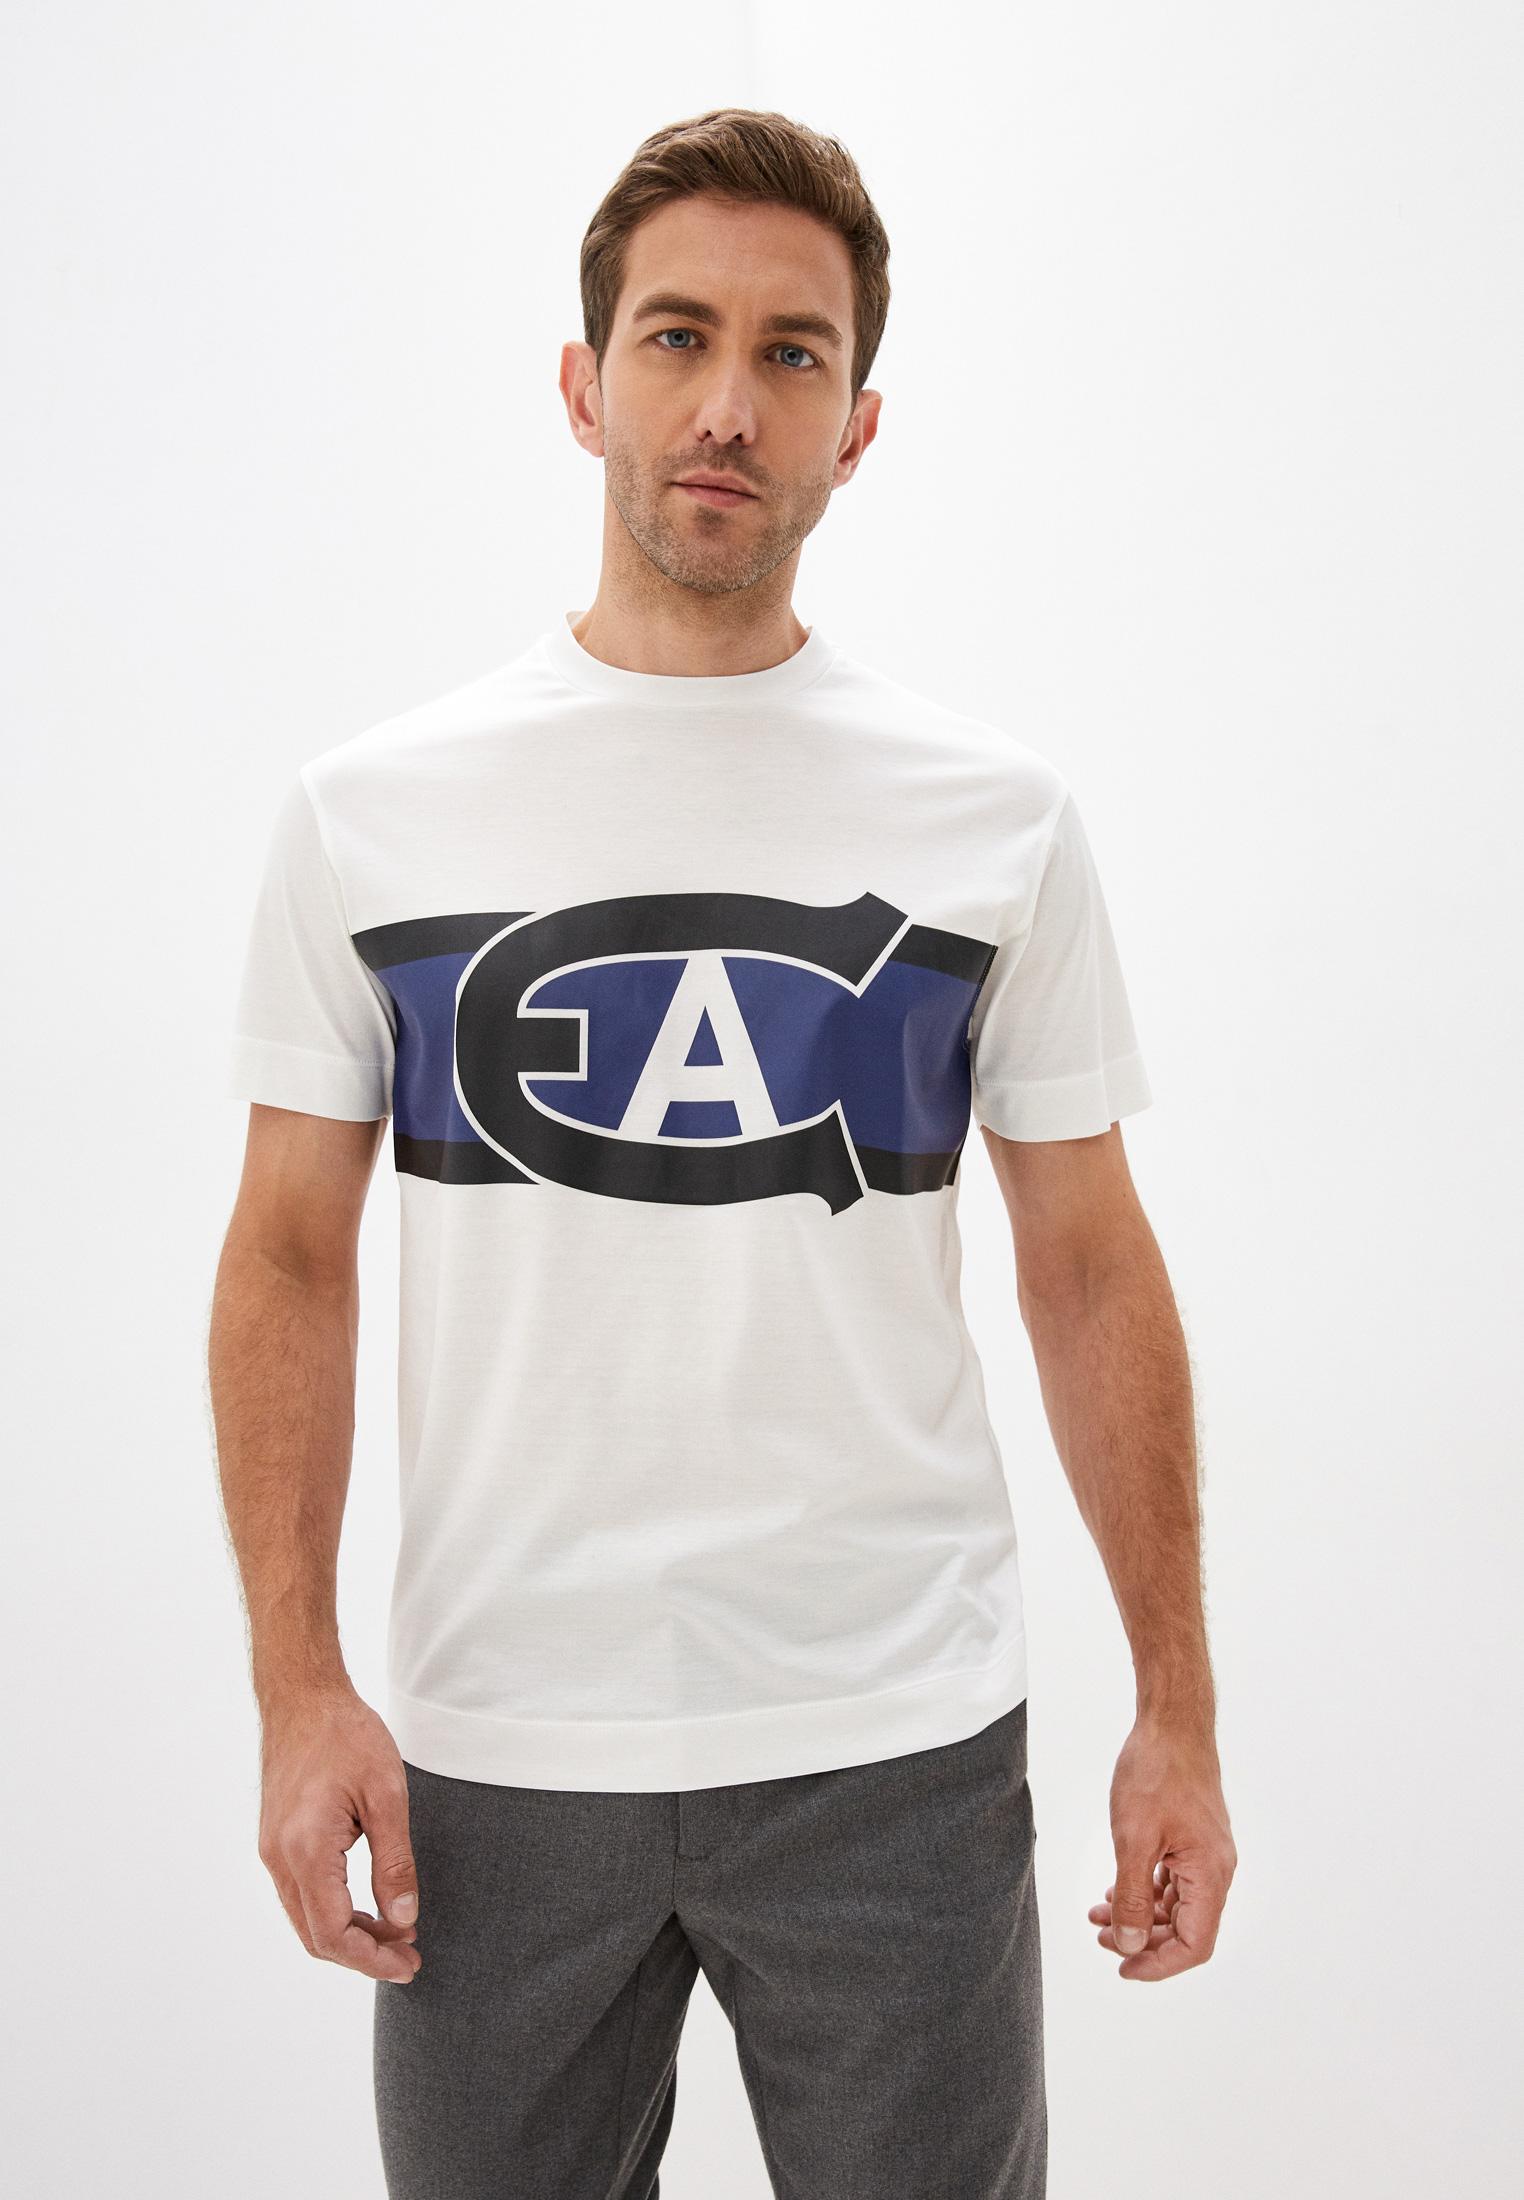 Мужская футболка Emporio Armani (Эмпорио Армани) 6K1TD7 1JUVZ